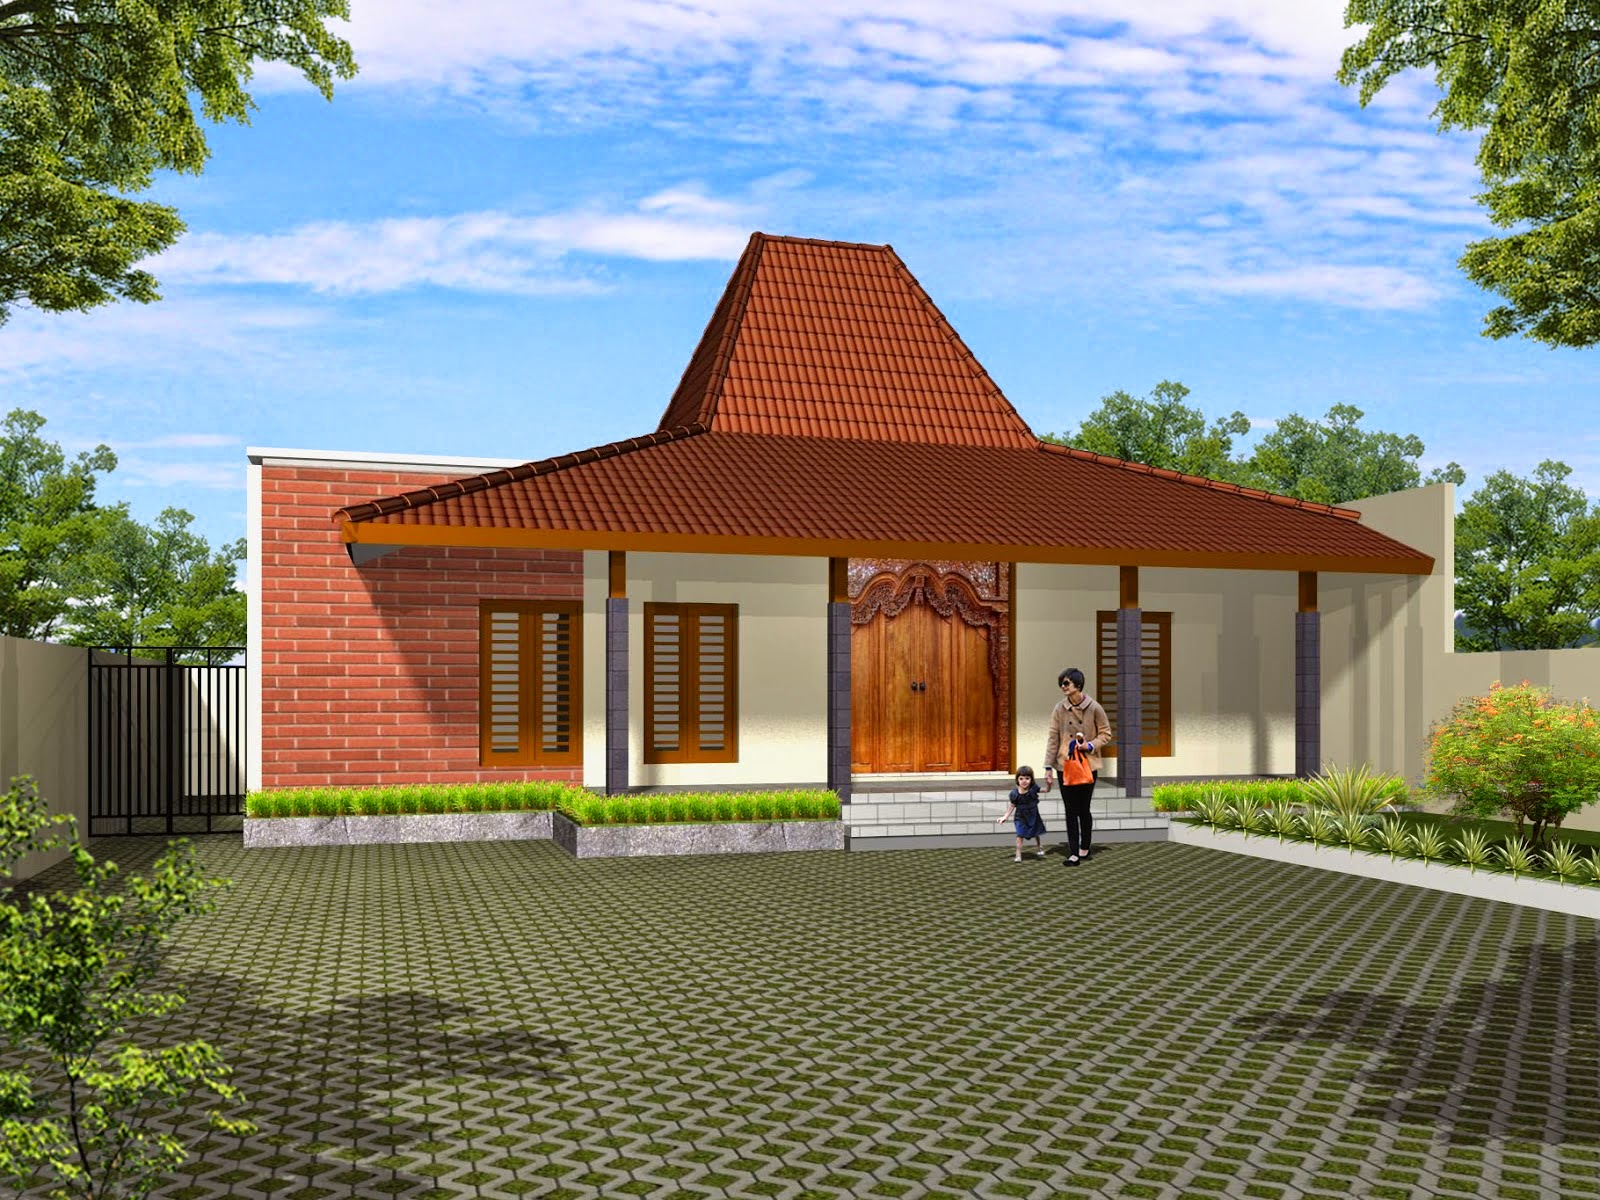 Rumah Joglo Jawa Modern Rumah Joglo Limasan Work